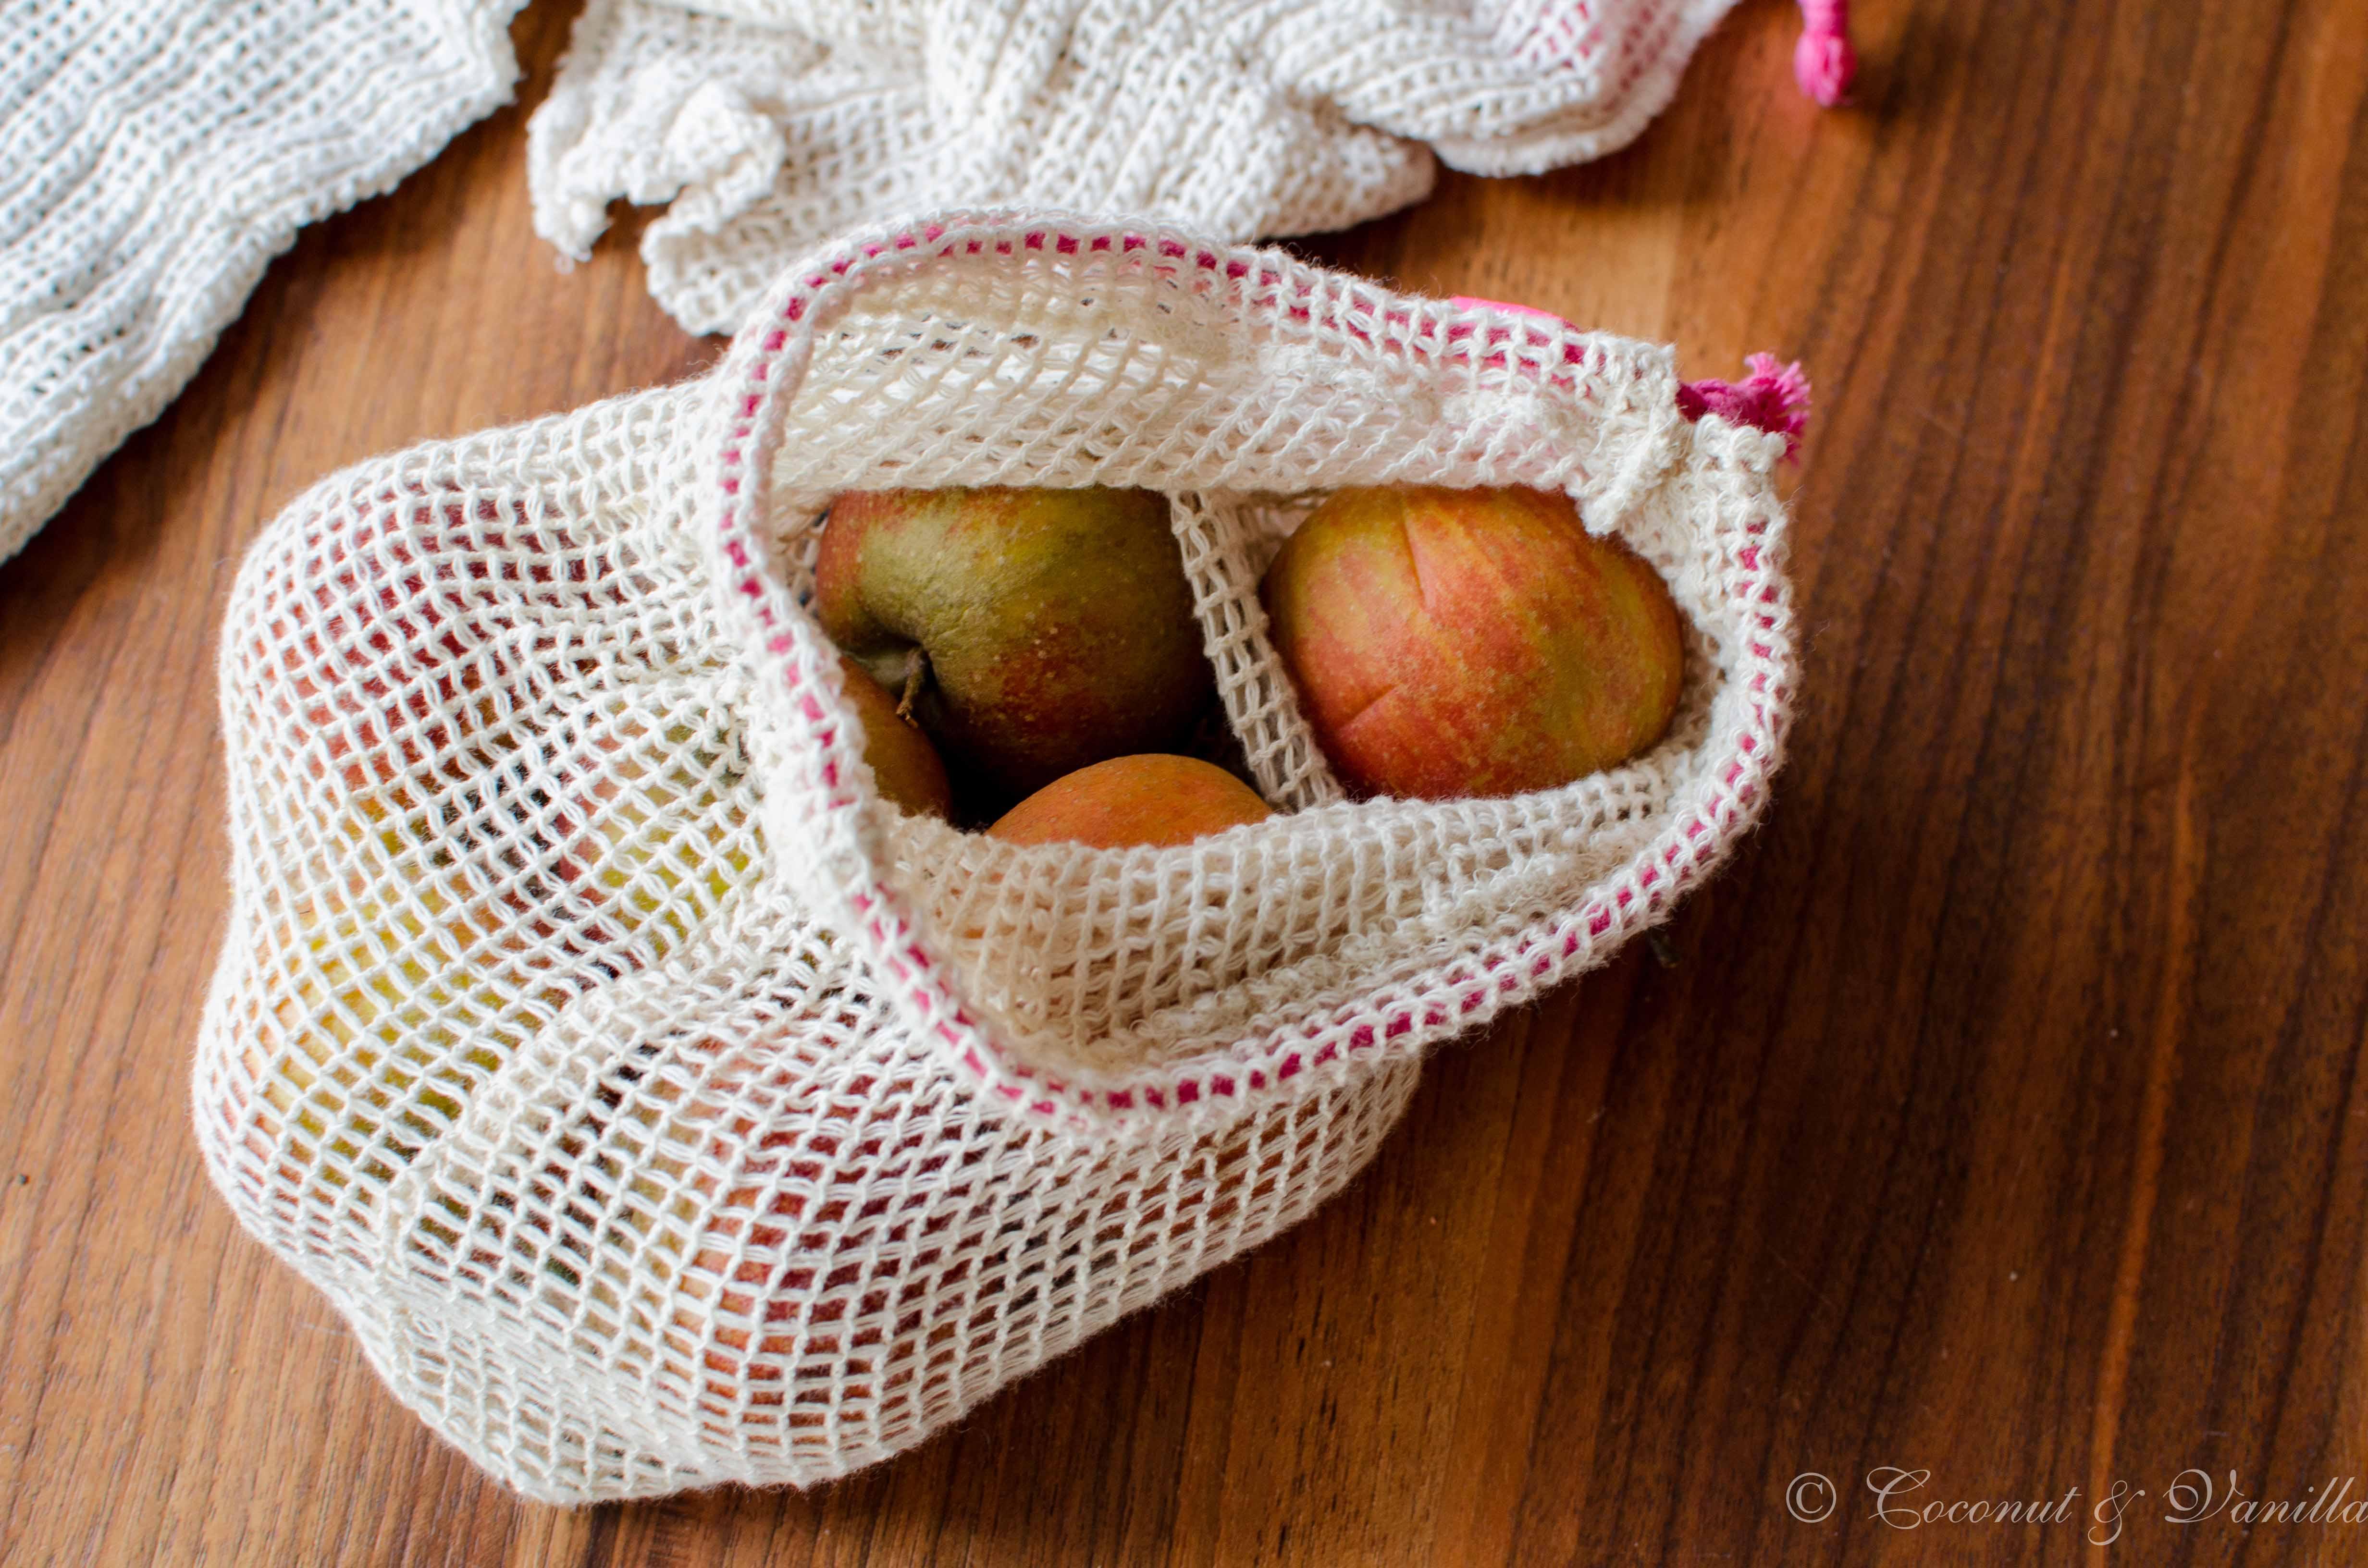 Greenderella Baumwollsäckchen mit Äpfeln